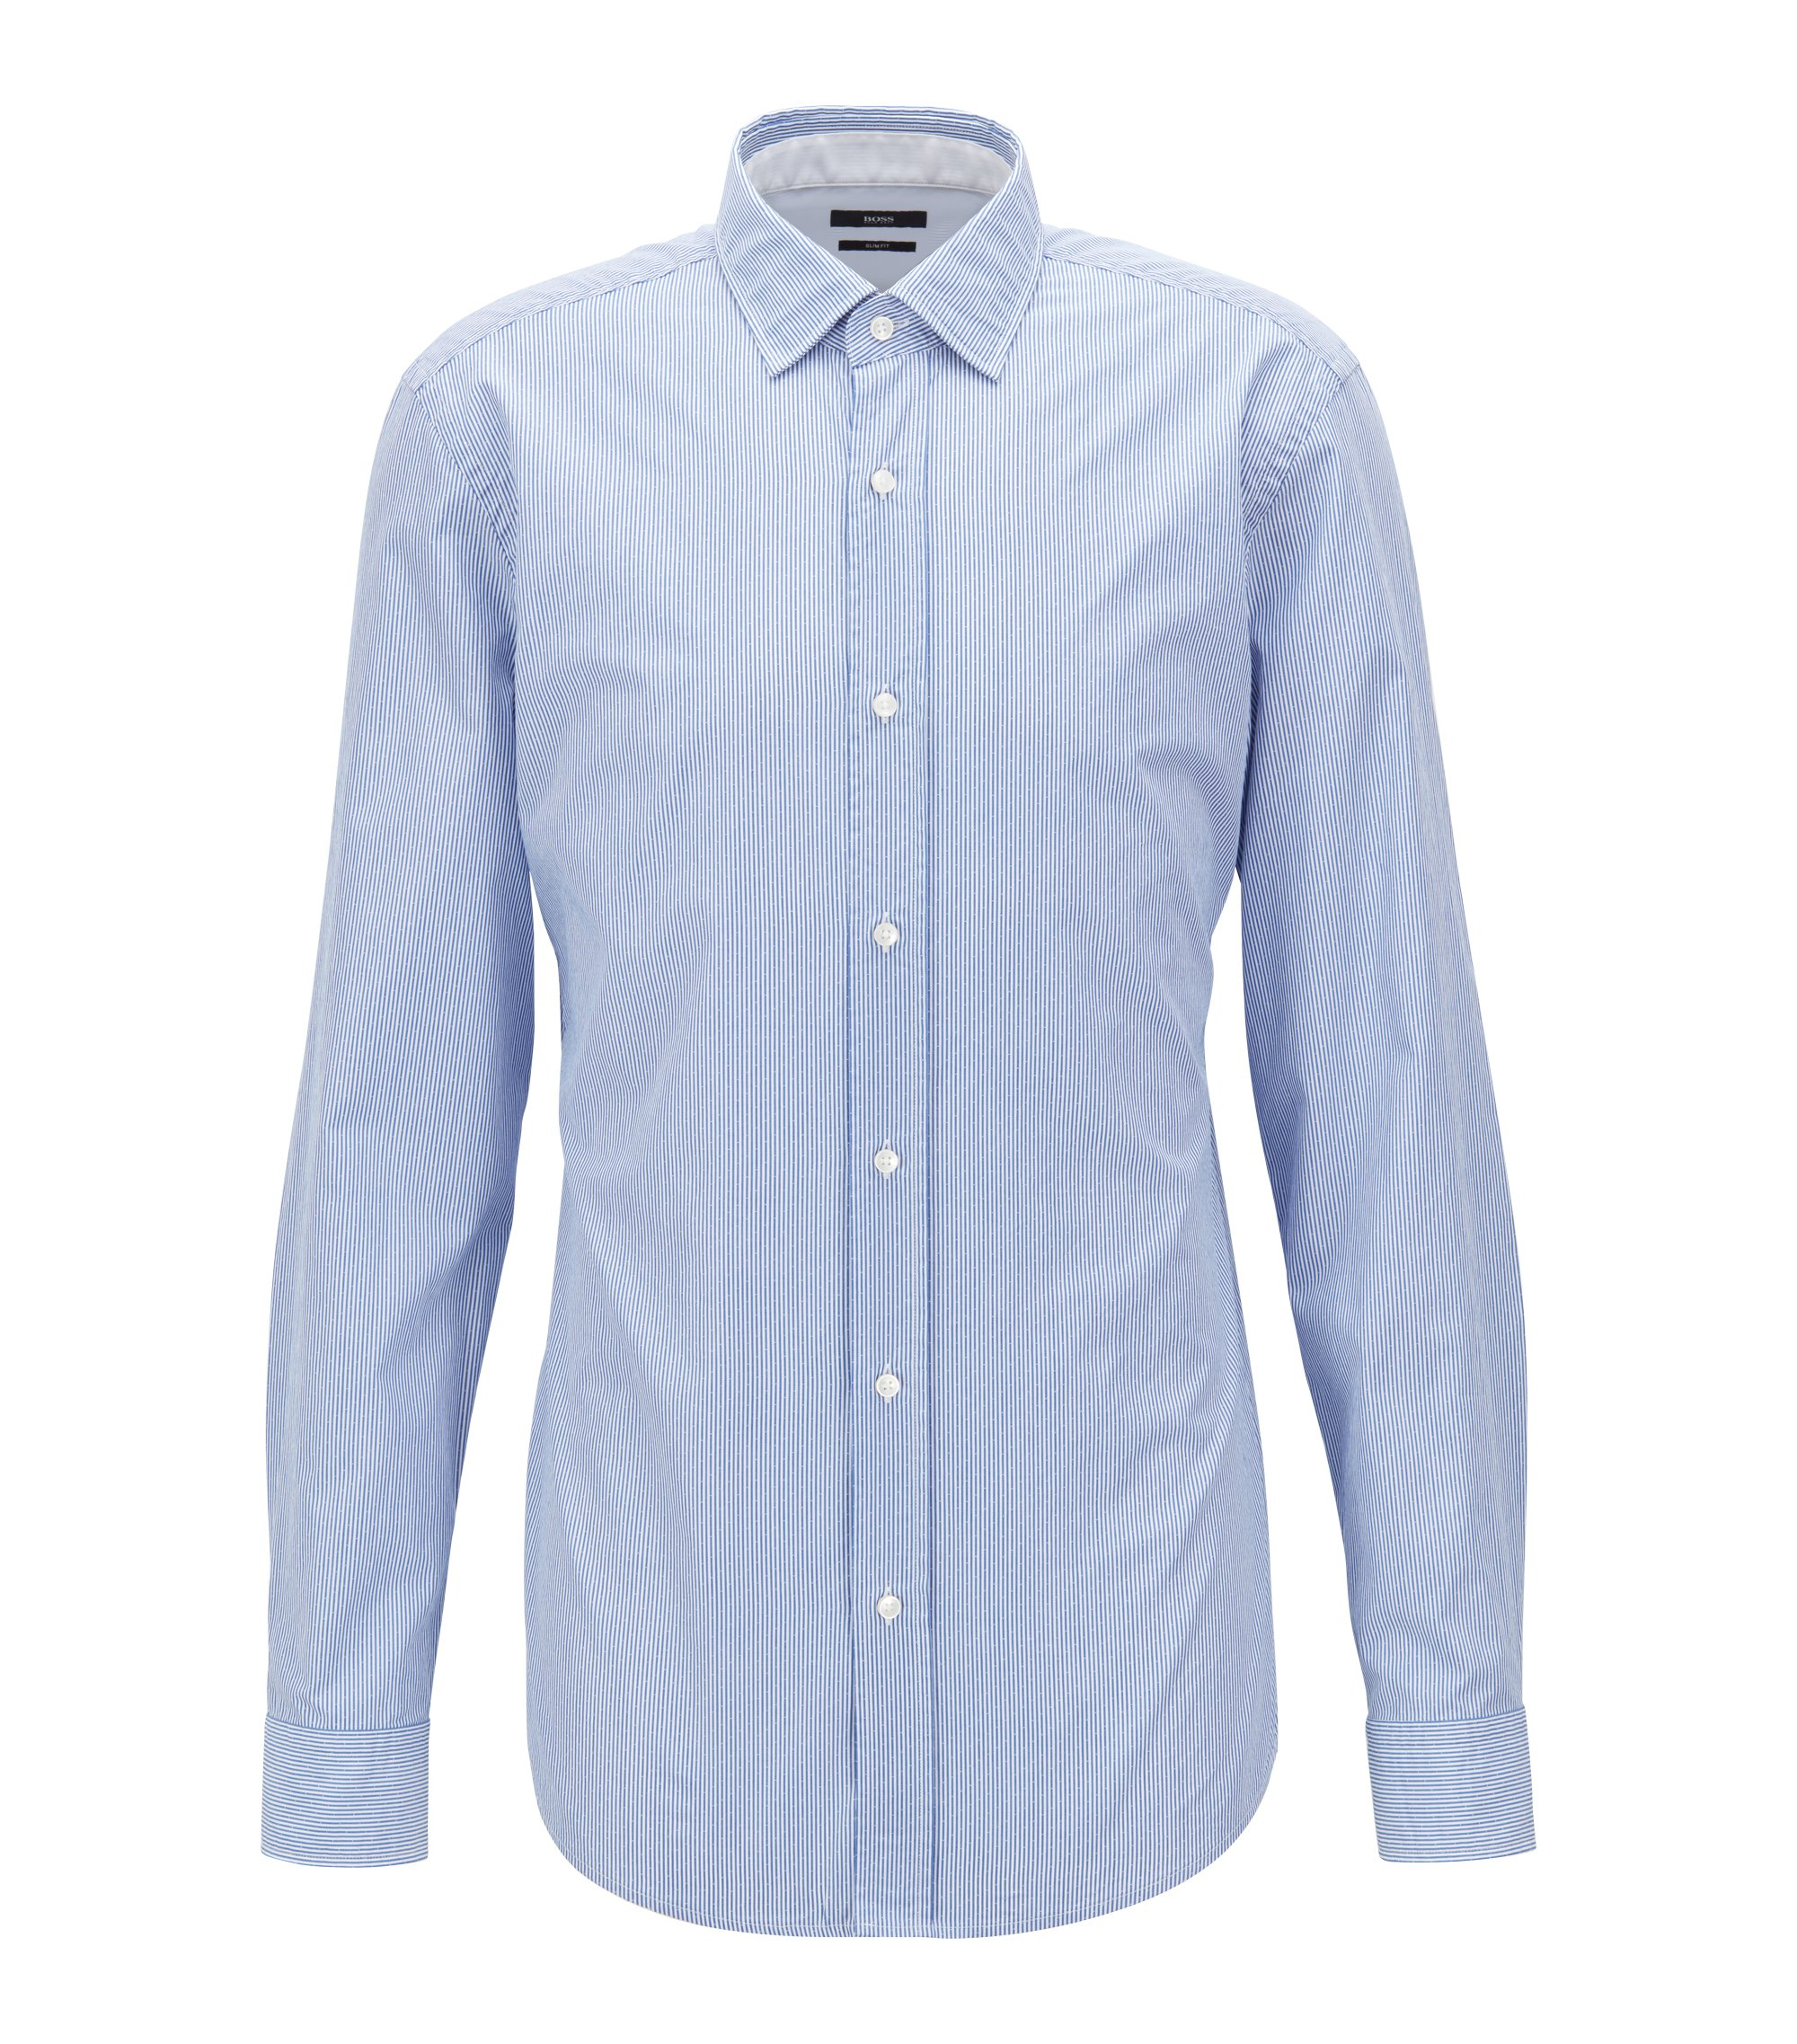 Slim-fit shirt in striped dobby cotton poplin, Open Blue